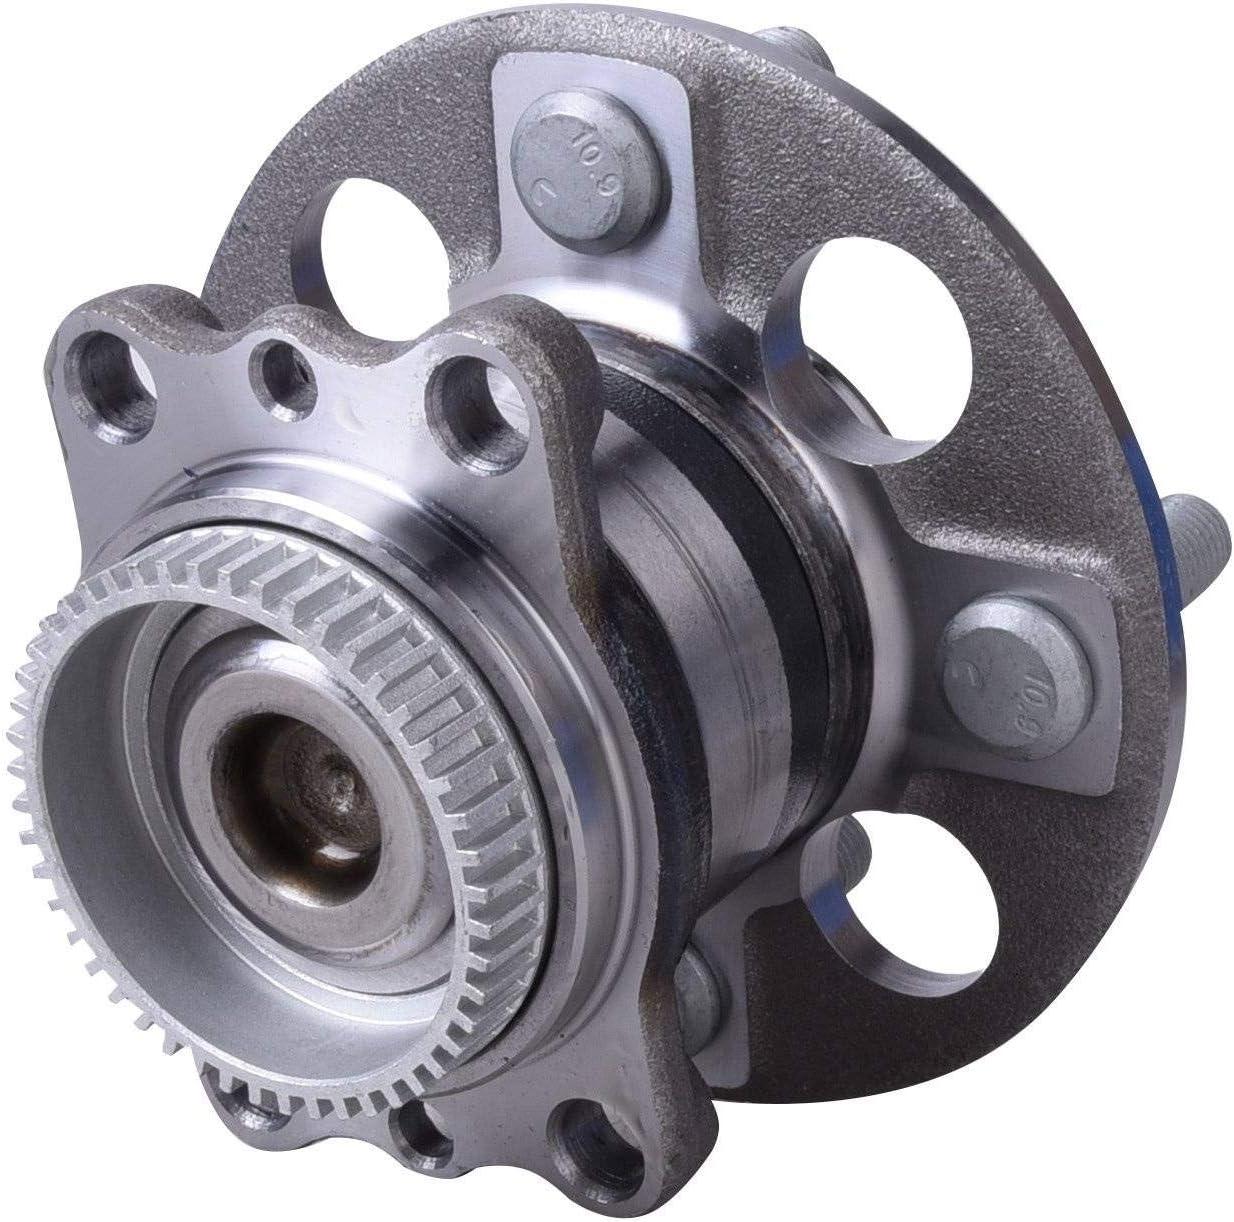 San Diego Mall Bapmic 52750-0U000 Rear Left or Right Assembly Wheel Bearing Finally popular brand Hub